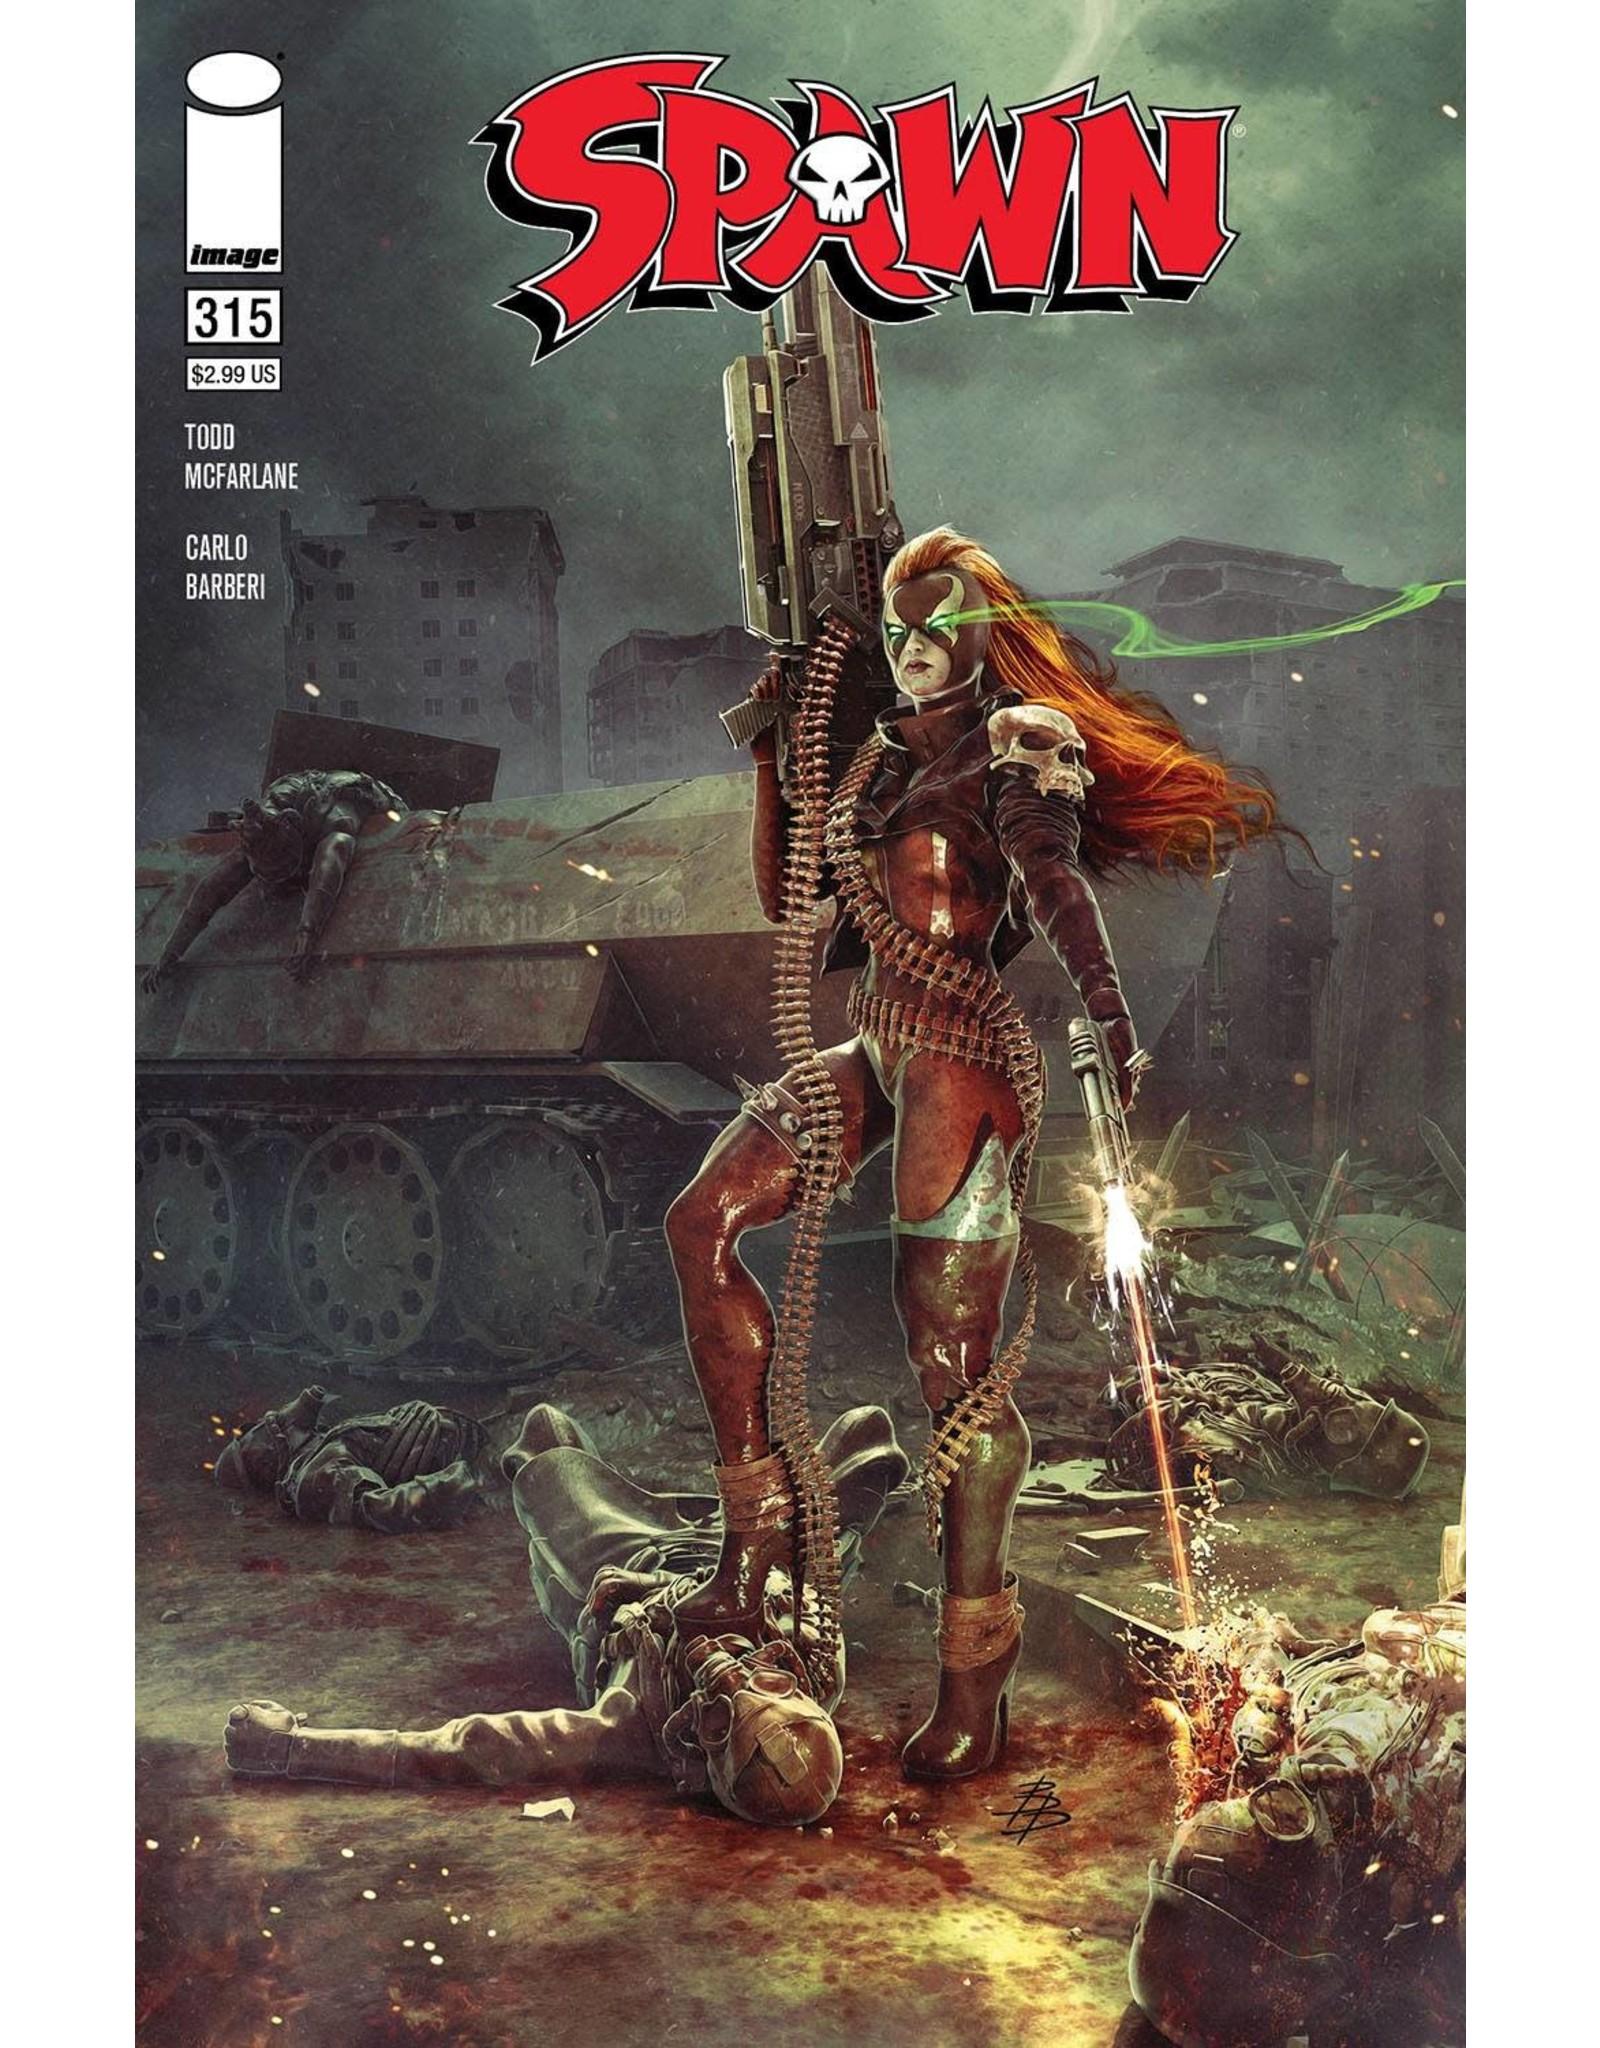 Image Comics SPAWN #315 CVR A BARENDS